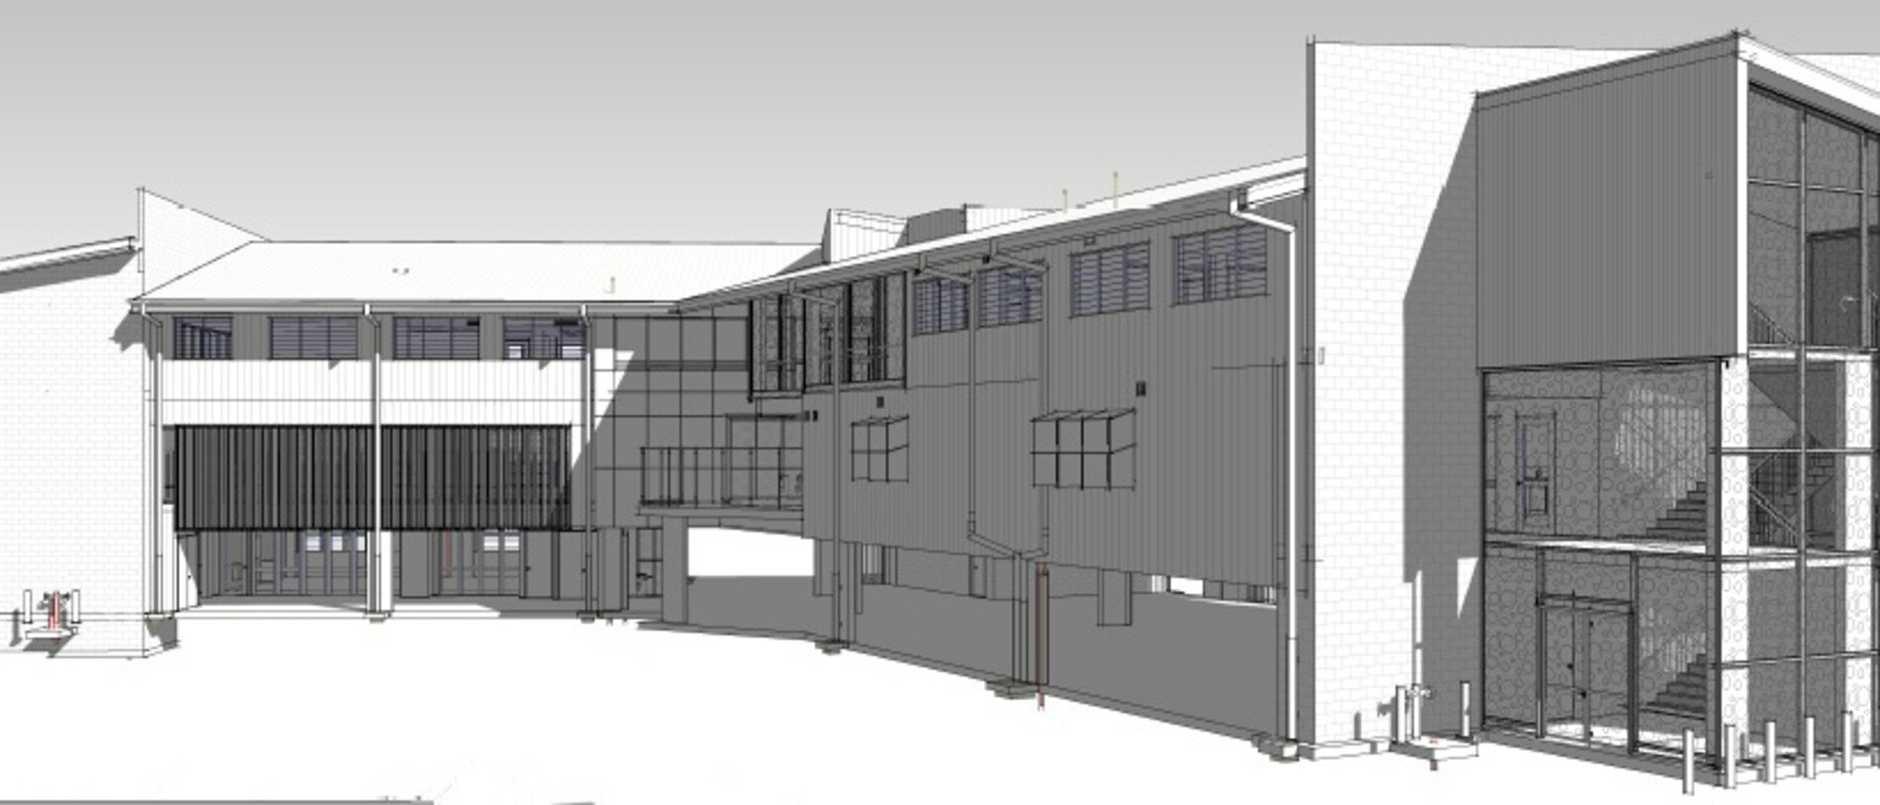 BUILDING EDUCATION: Artist's impression of Bundaberg SHS new secondary learning centre.